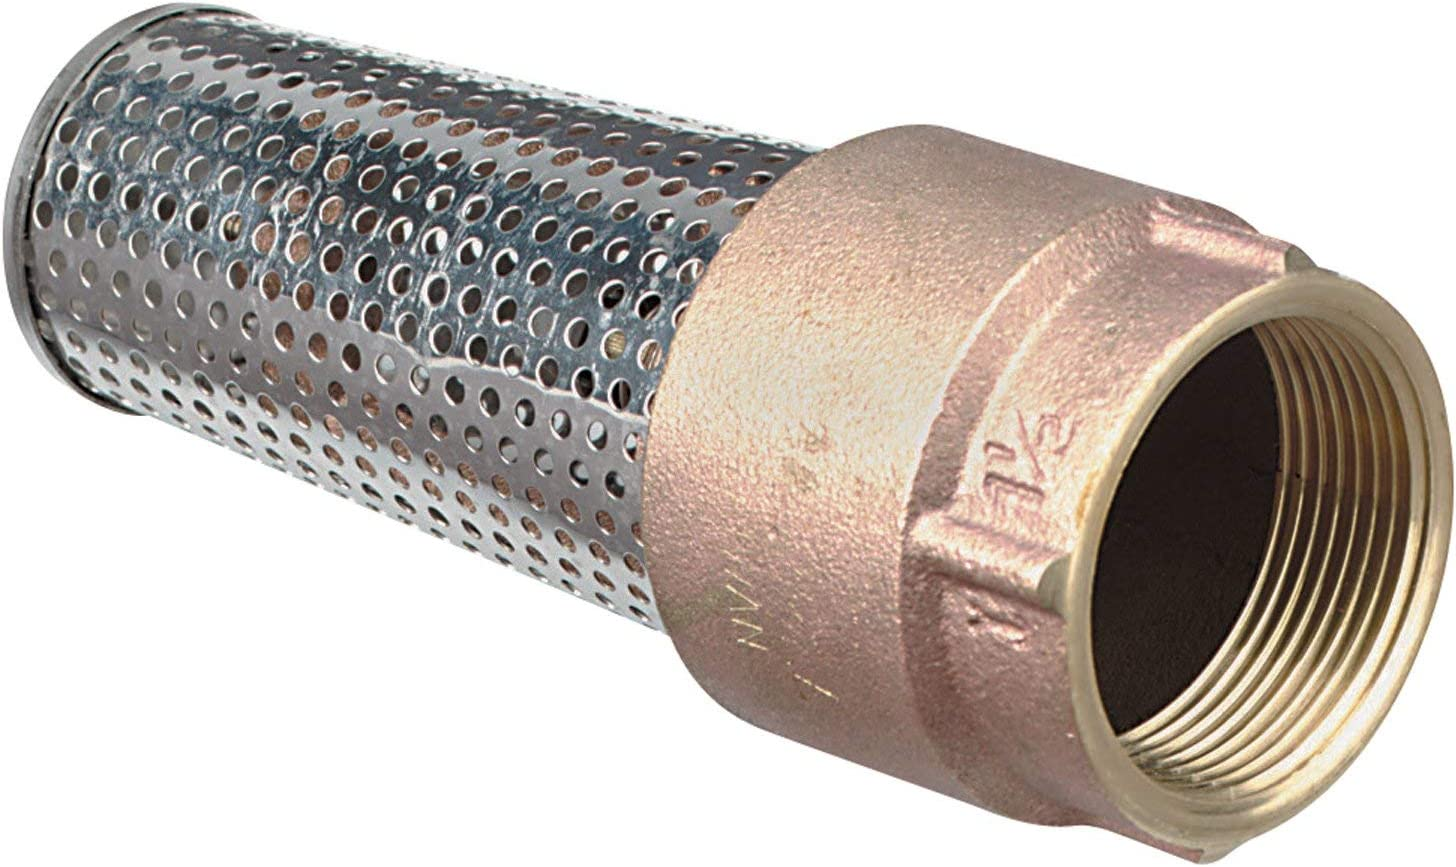 Leakproof Brass Foot Valve-1in #TC2503LF-P2